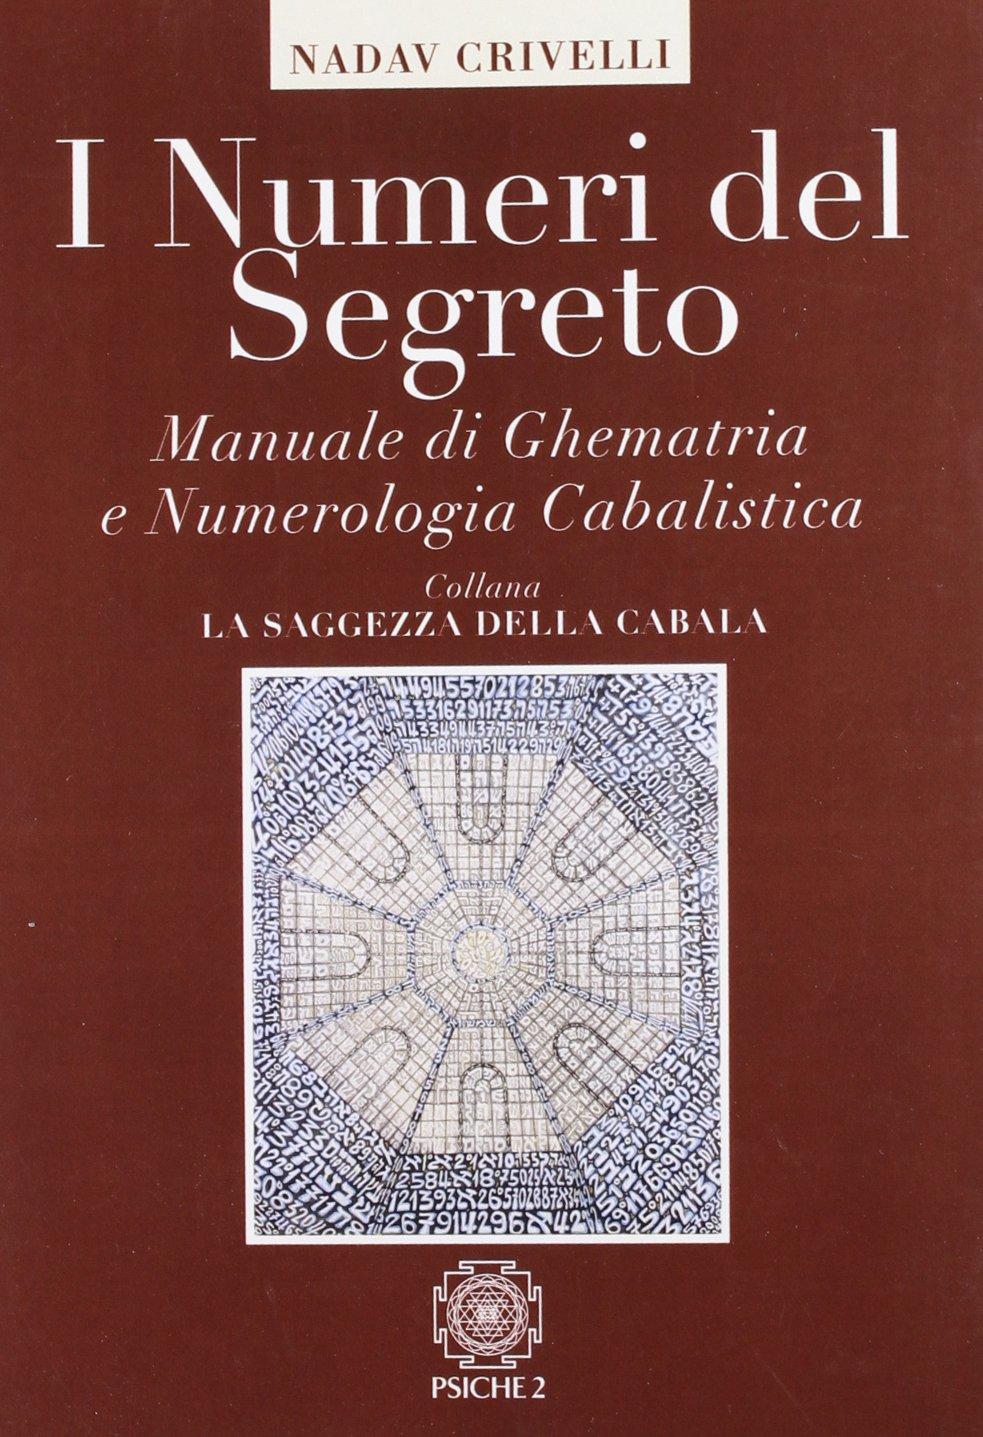 Manuale di ghematria e numerologia cabalistica: Amazon.it: Eliahu Crivelli  Nadav: Libri